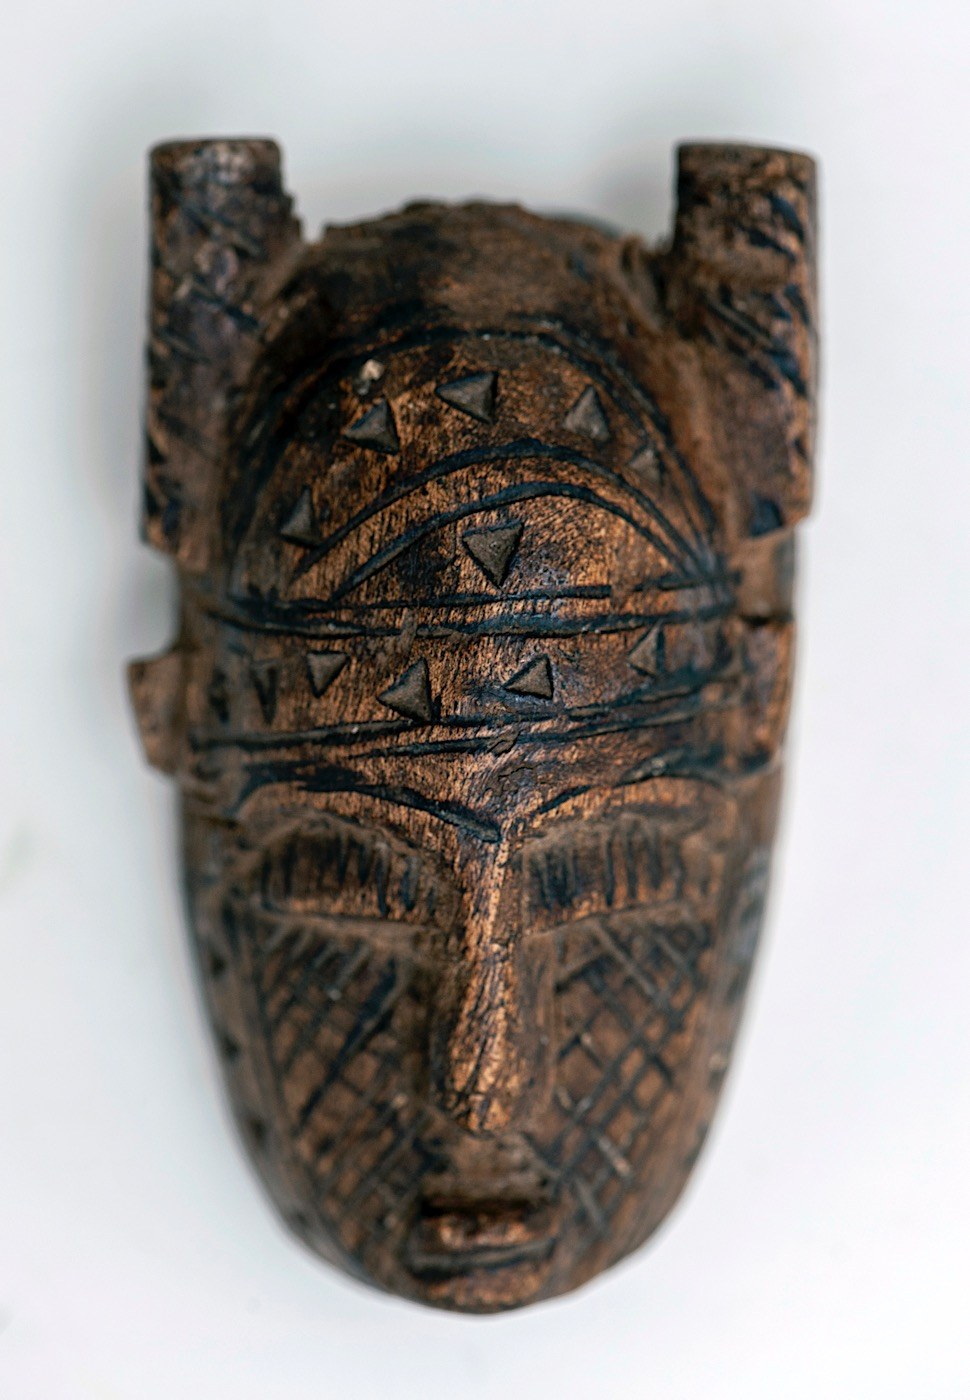 Maska mała, MALINKE, Gwinea, Afryka